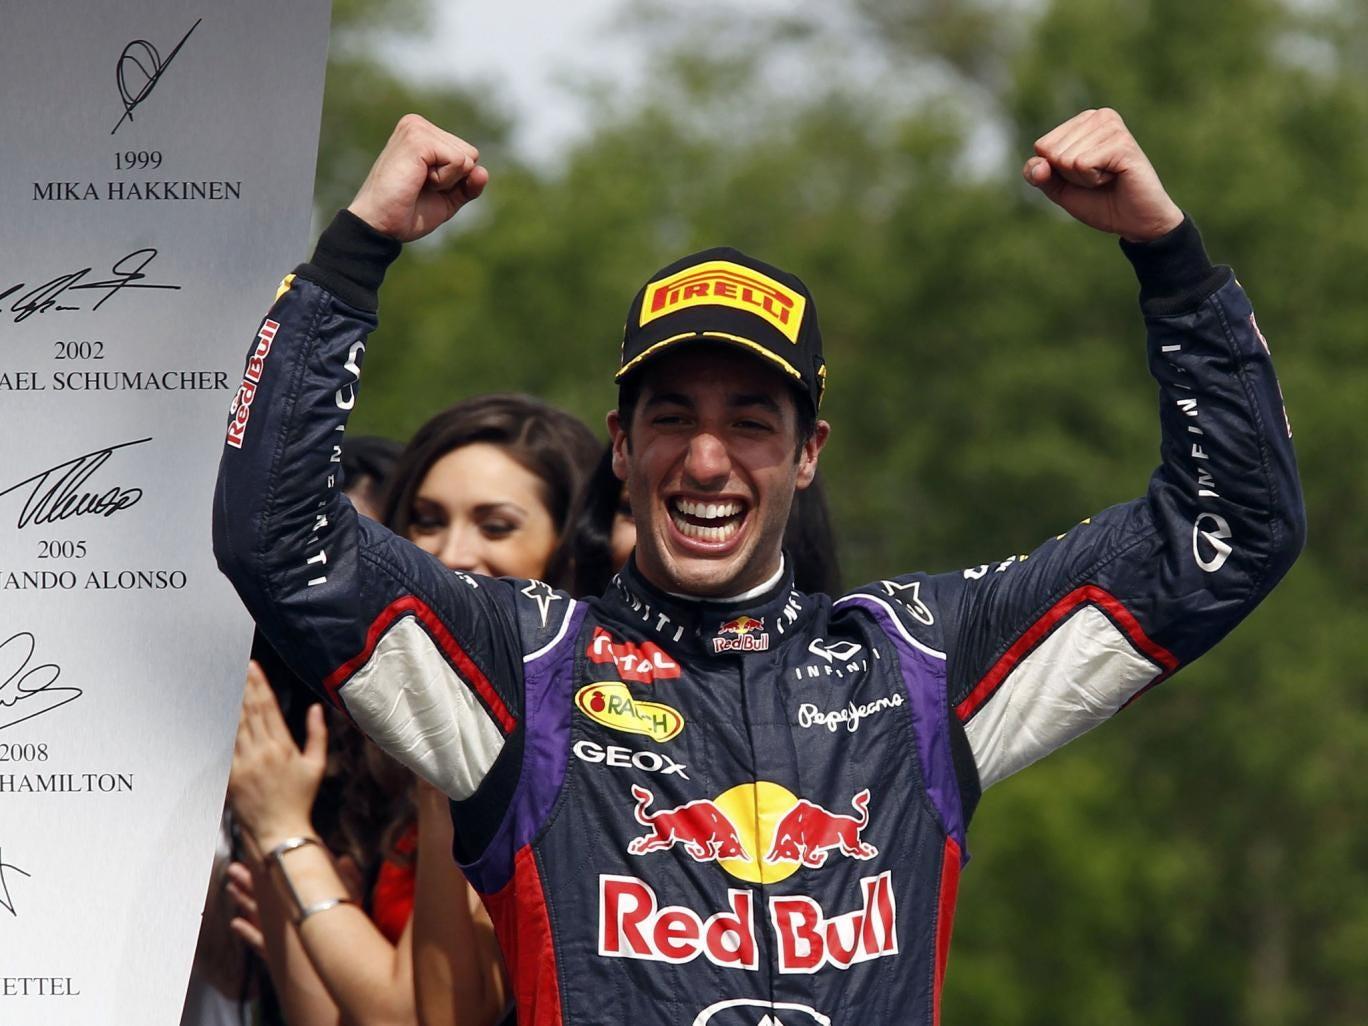 Red Bull Formula One driver Daniel Ricciardo of Australia celebrates after winning the Canadian F1 Grand Prix at the Circuit Gilles Villeneuve in Montreal